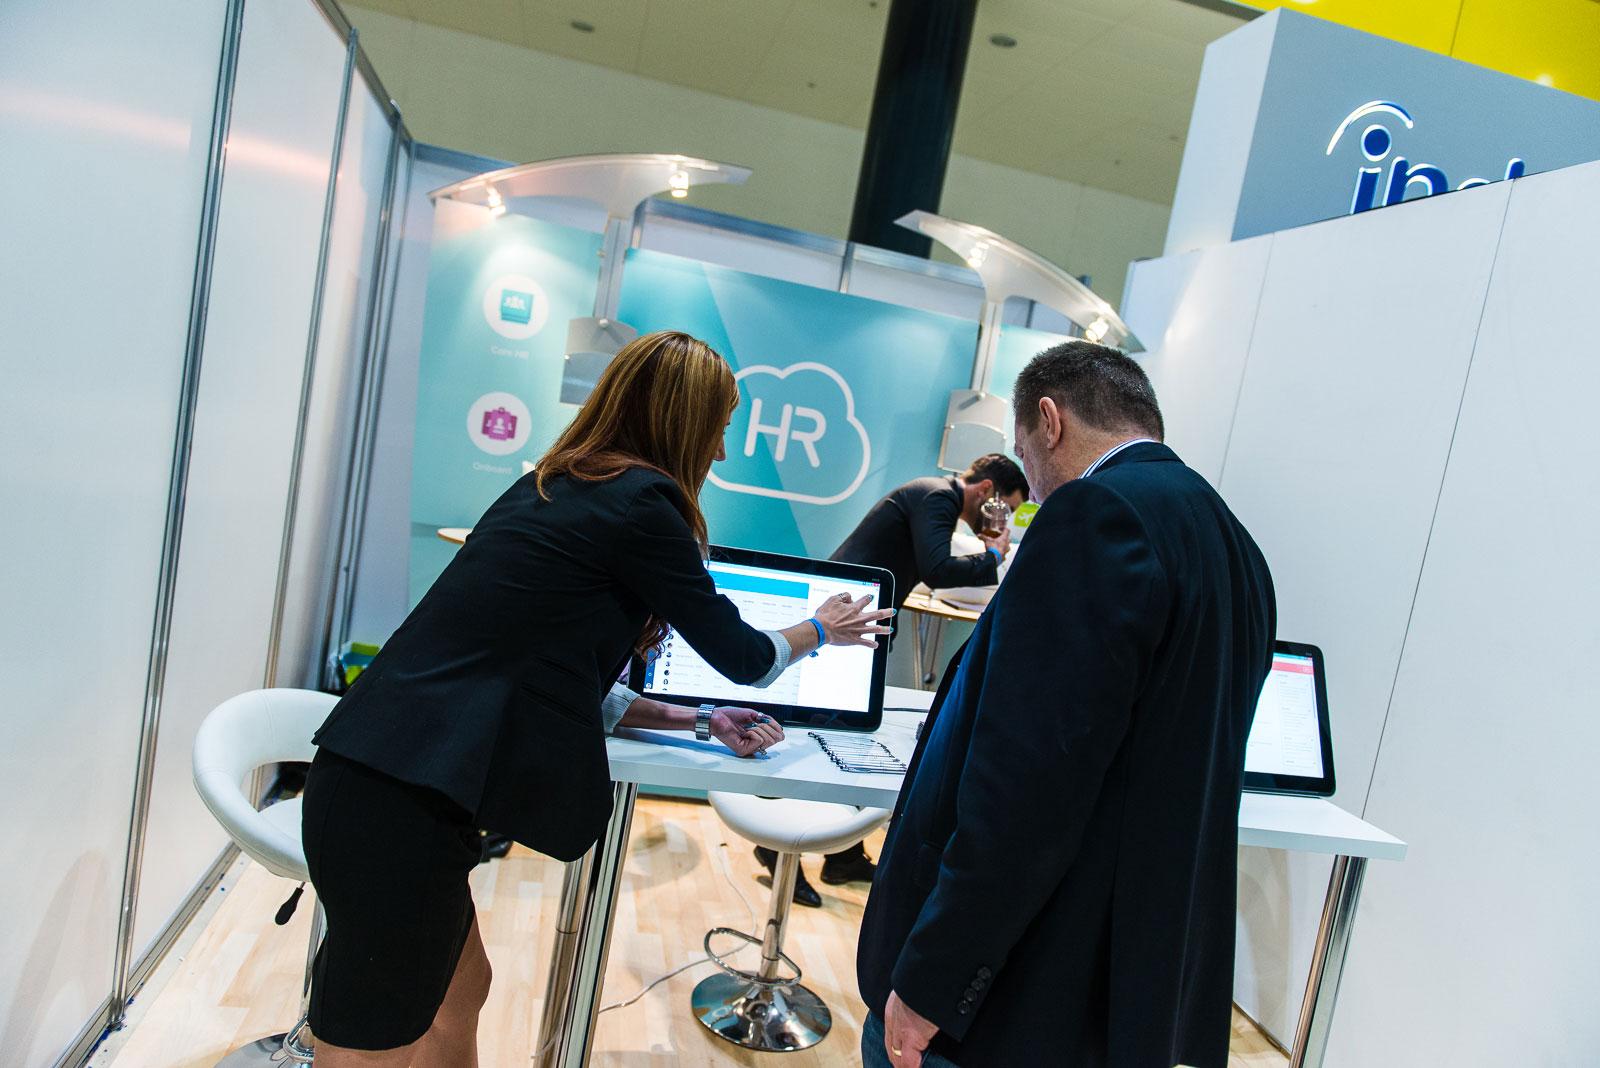 Pamela Kubiak, HR Cloud Product Manager, demos HR Cloud's Onboard and Core HR solution.